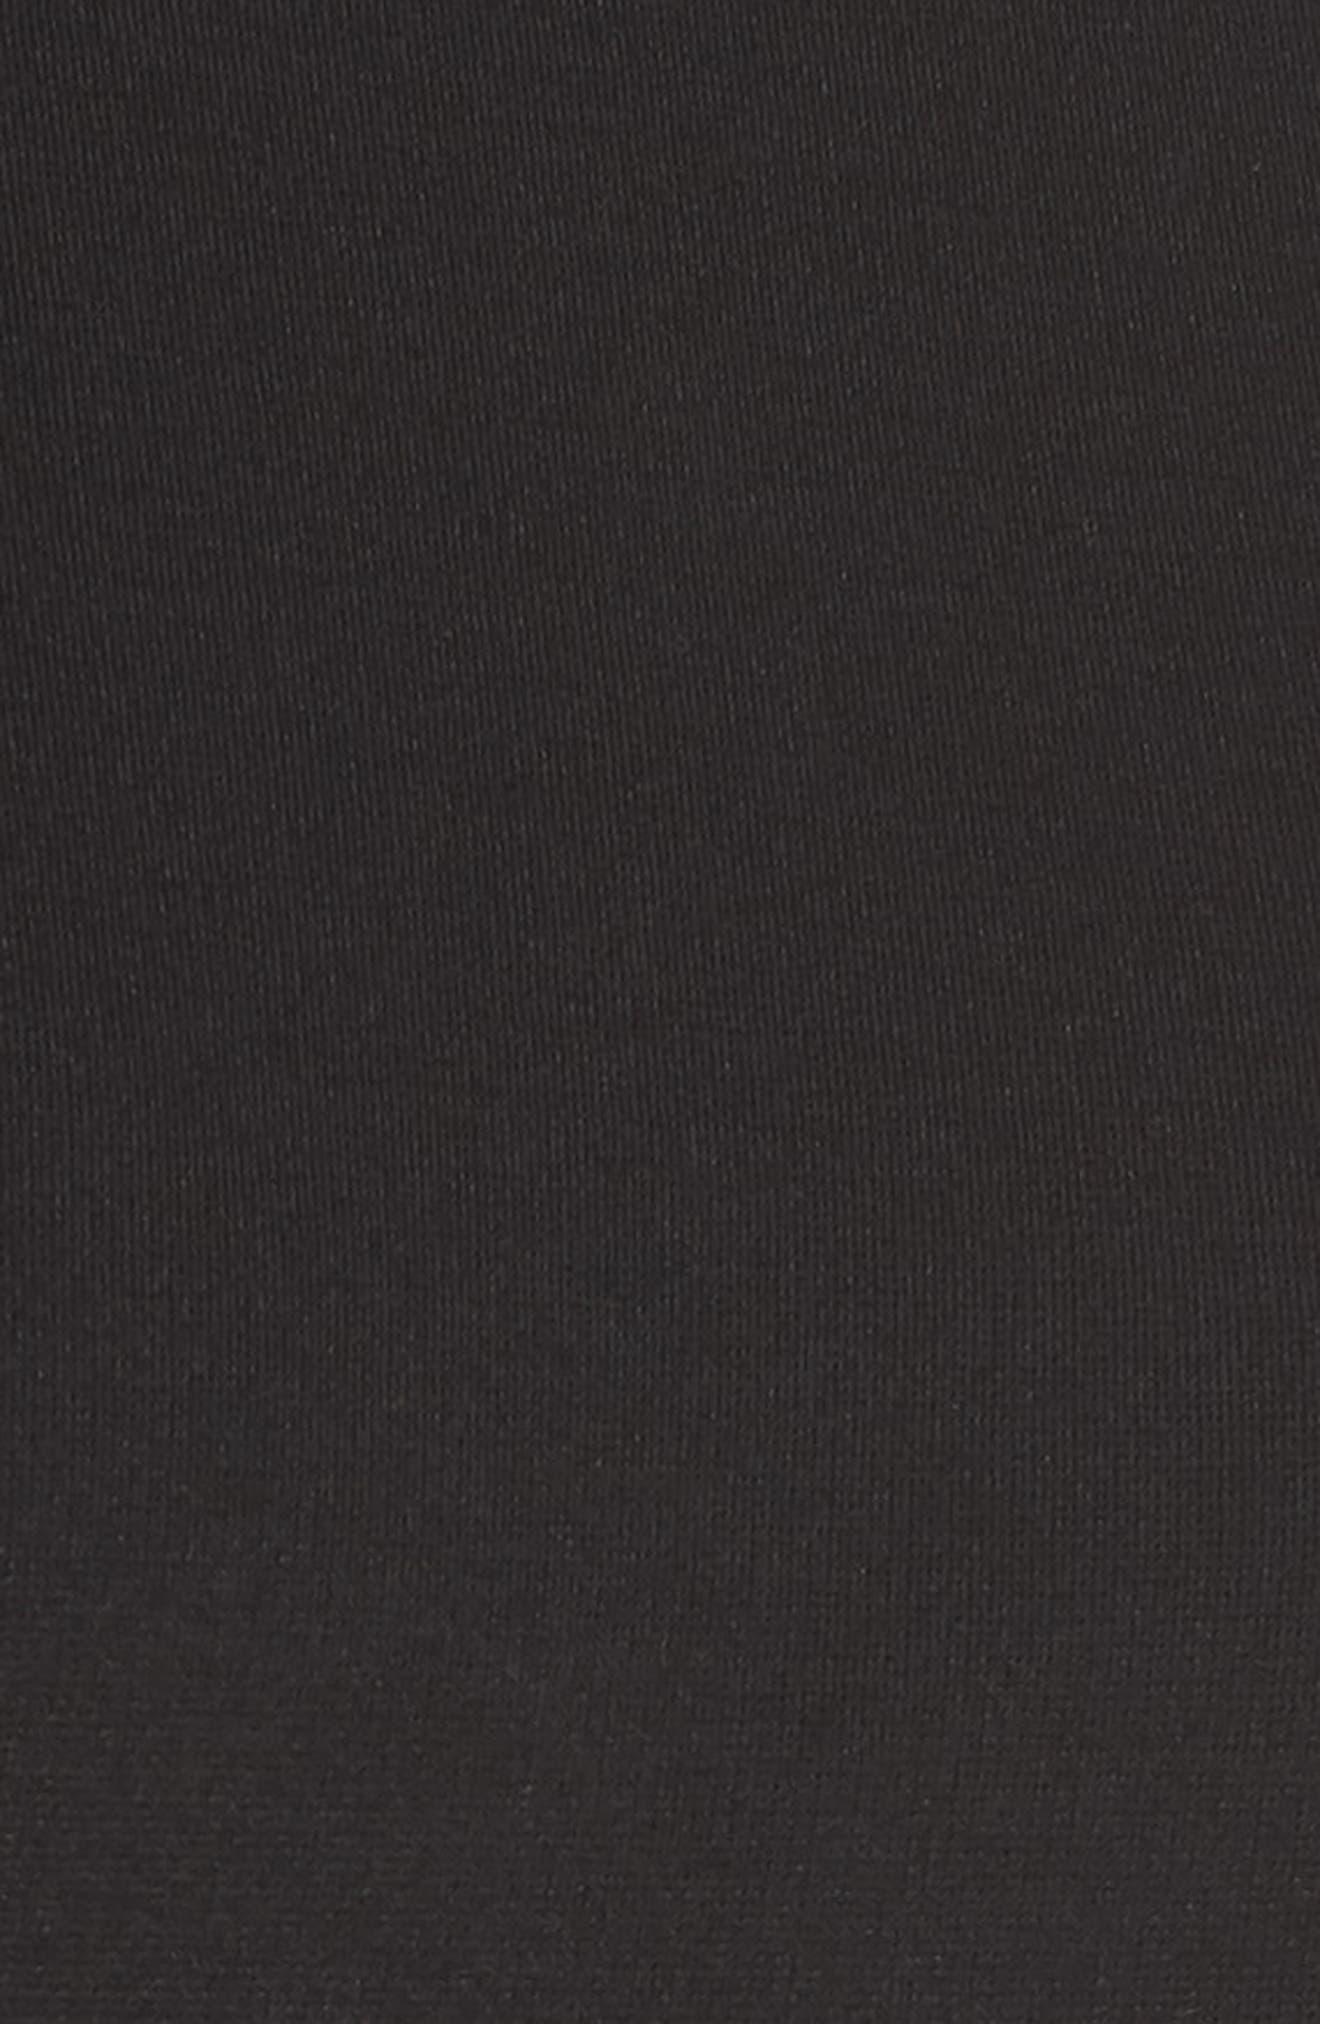 ALI & JAY, Zip Back Sheath Dress, Alternate thumbnail 6, color, BLACK